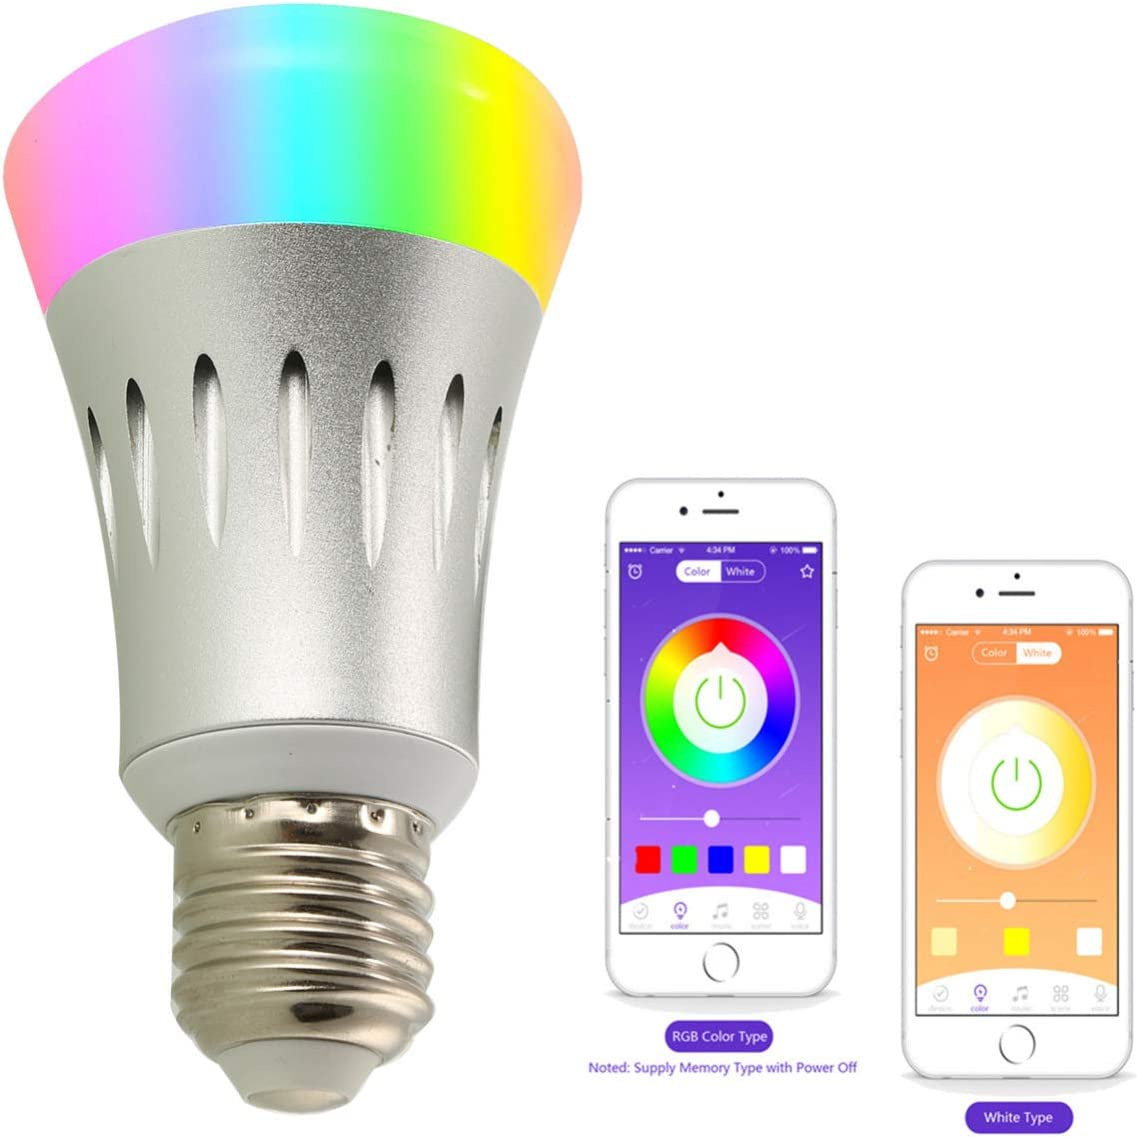 Mobestech 7W lgb LED compatibilidad de color B22/e27 inteligencia ...